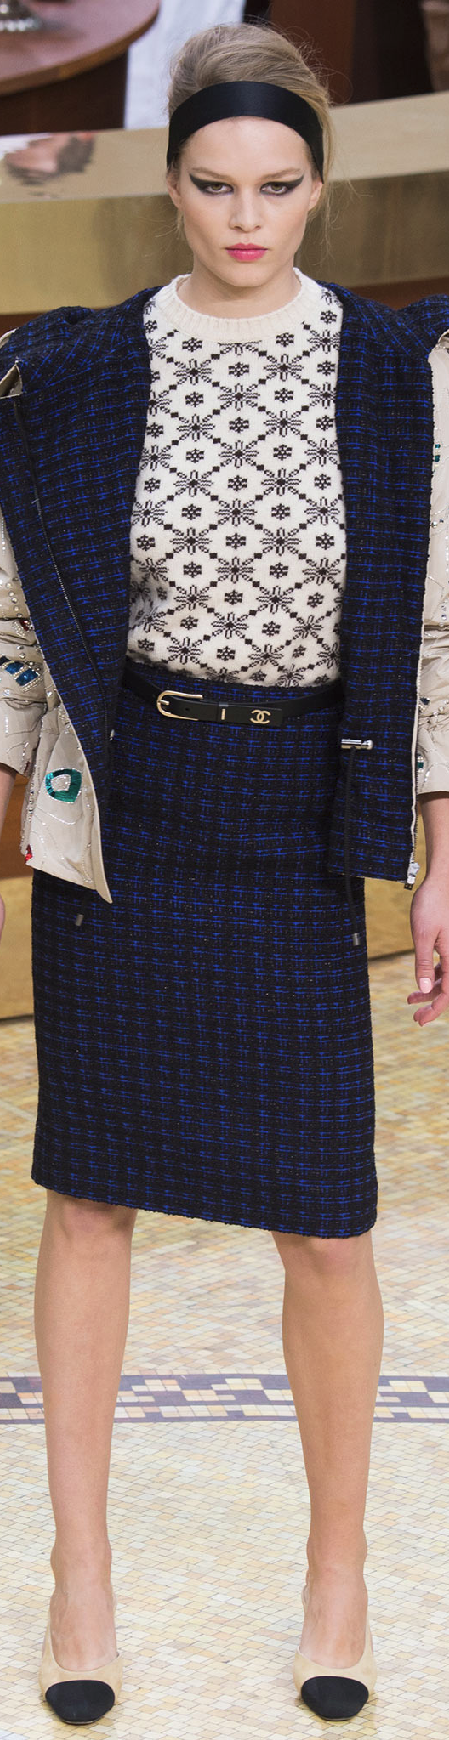 Fall 2015 Ready-to-Wear Chanel